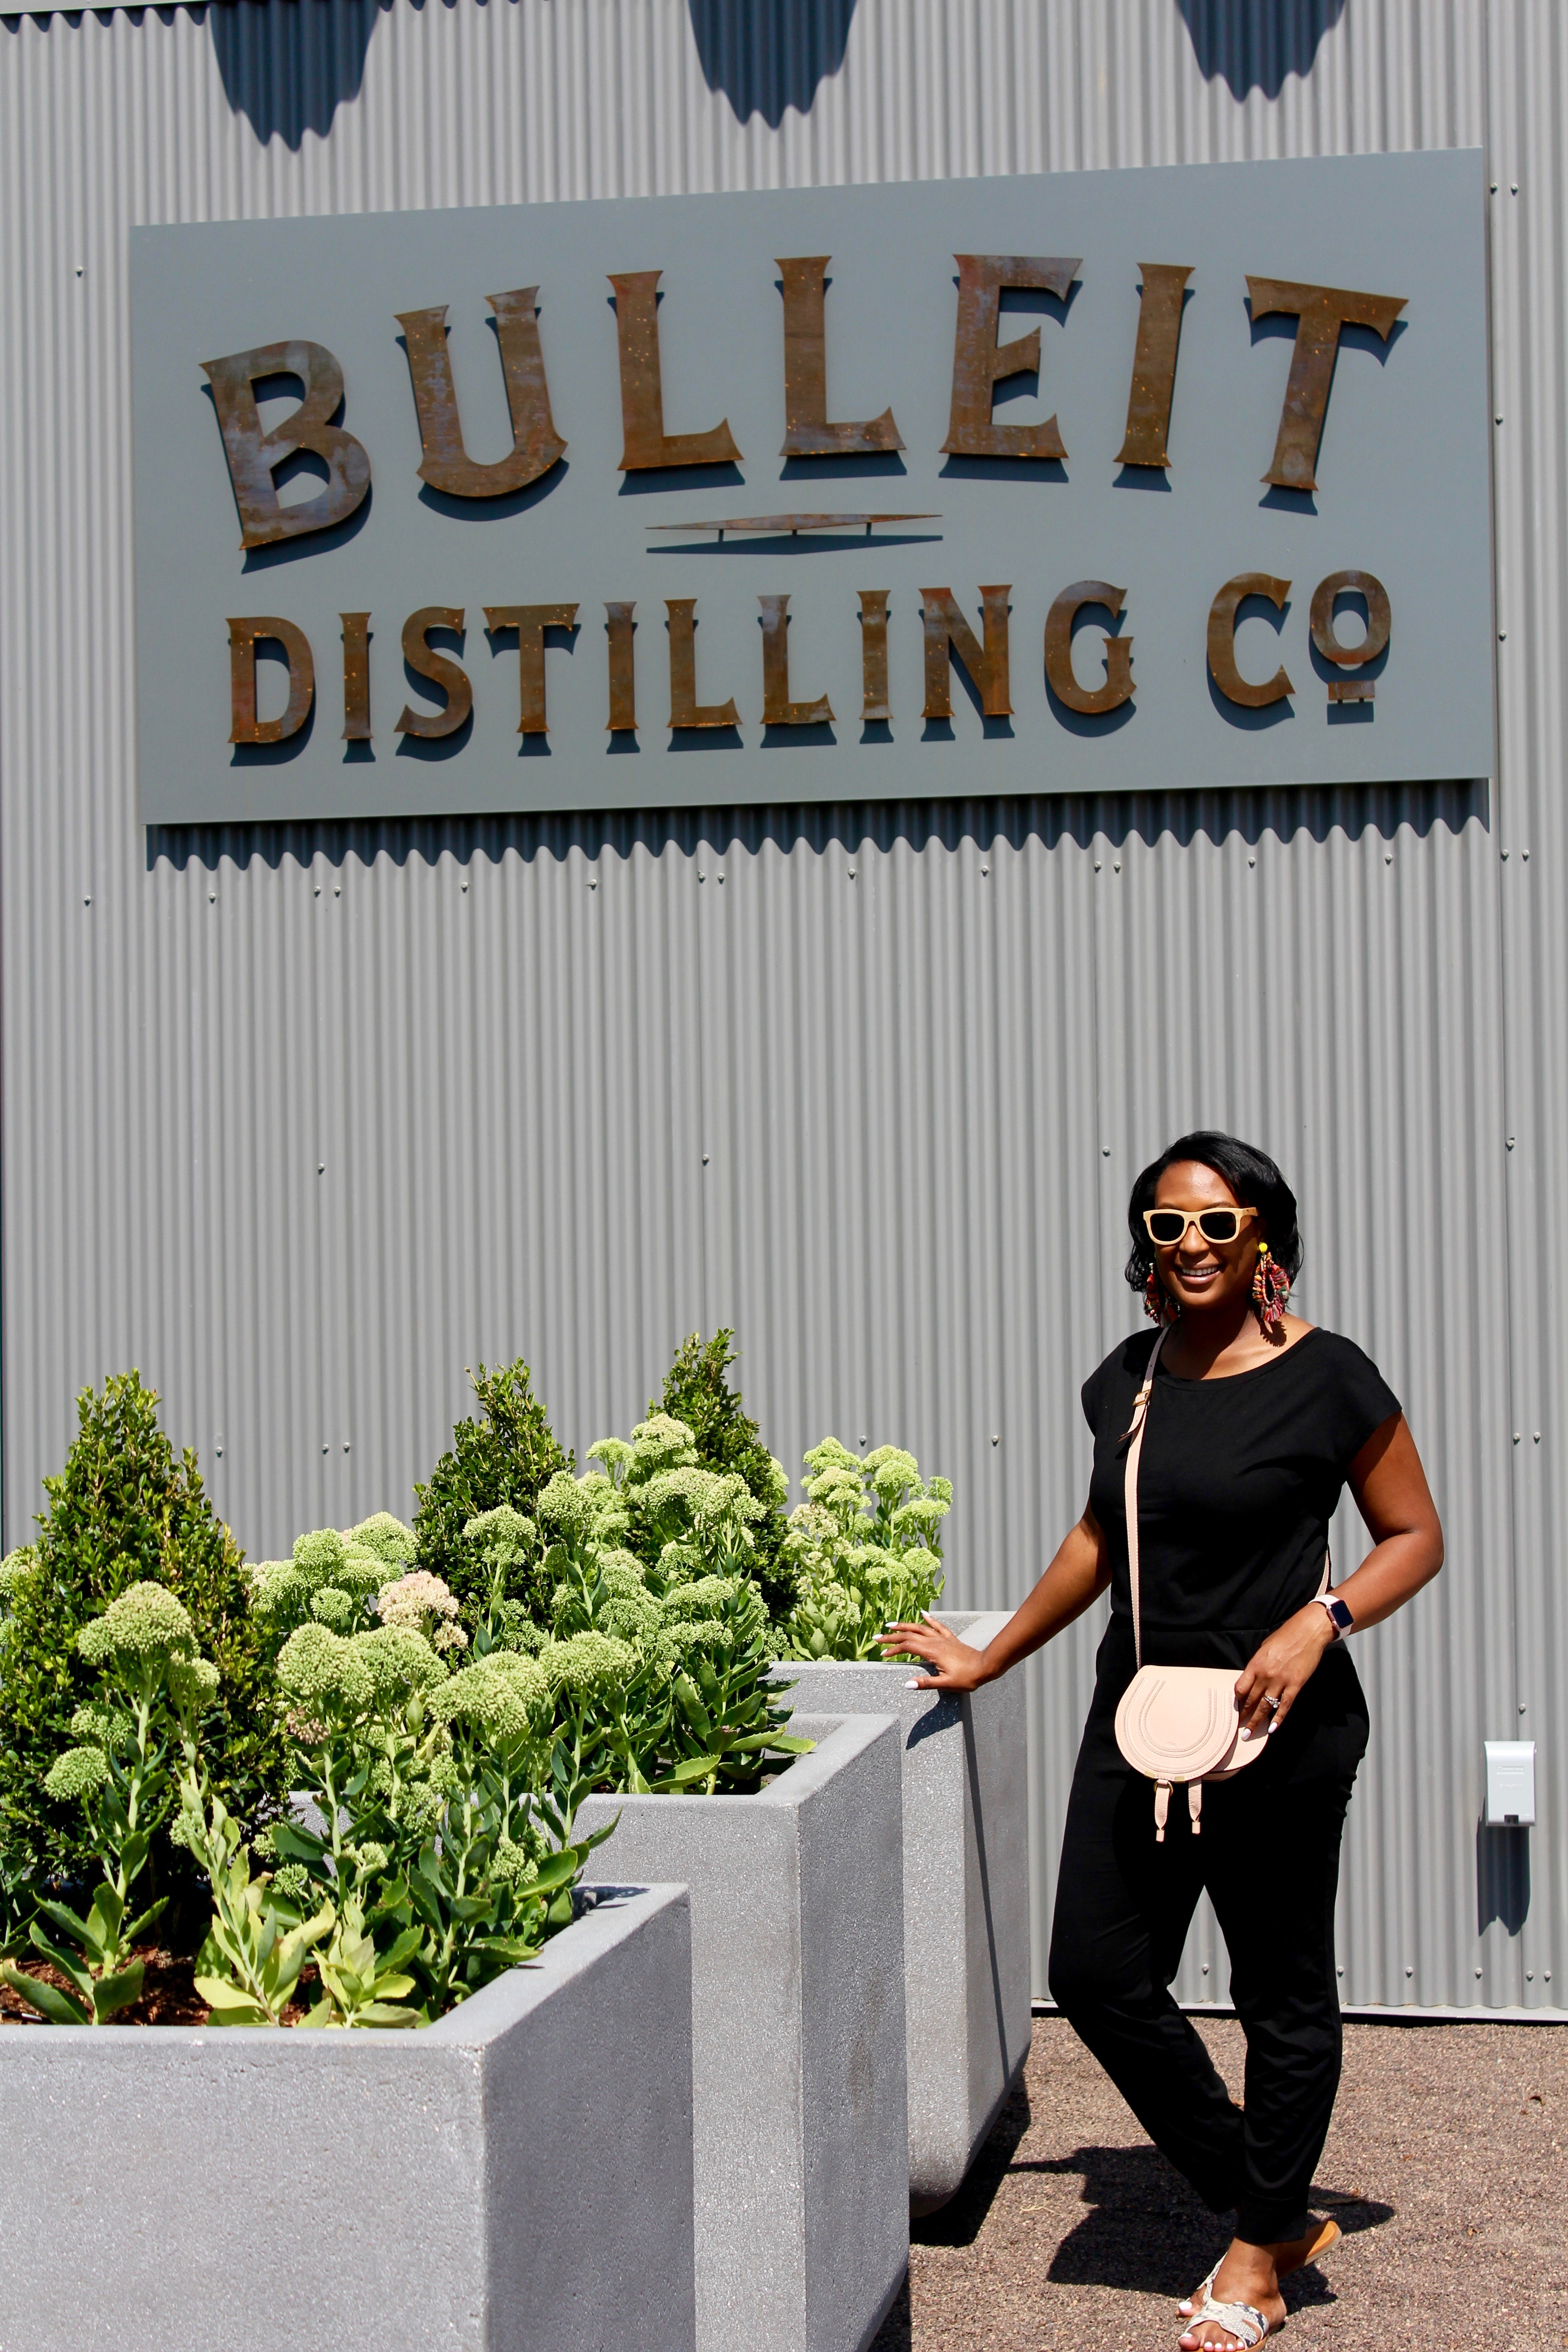 Bulleit Distilling Co.